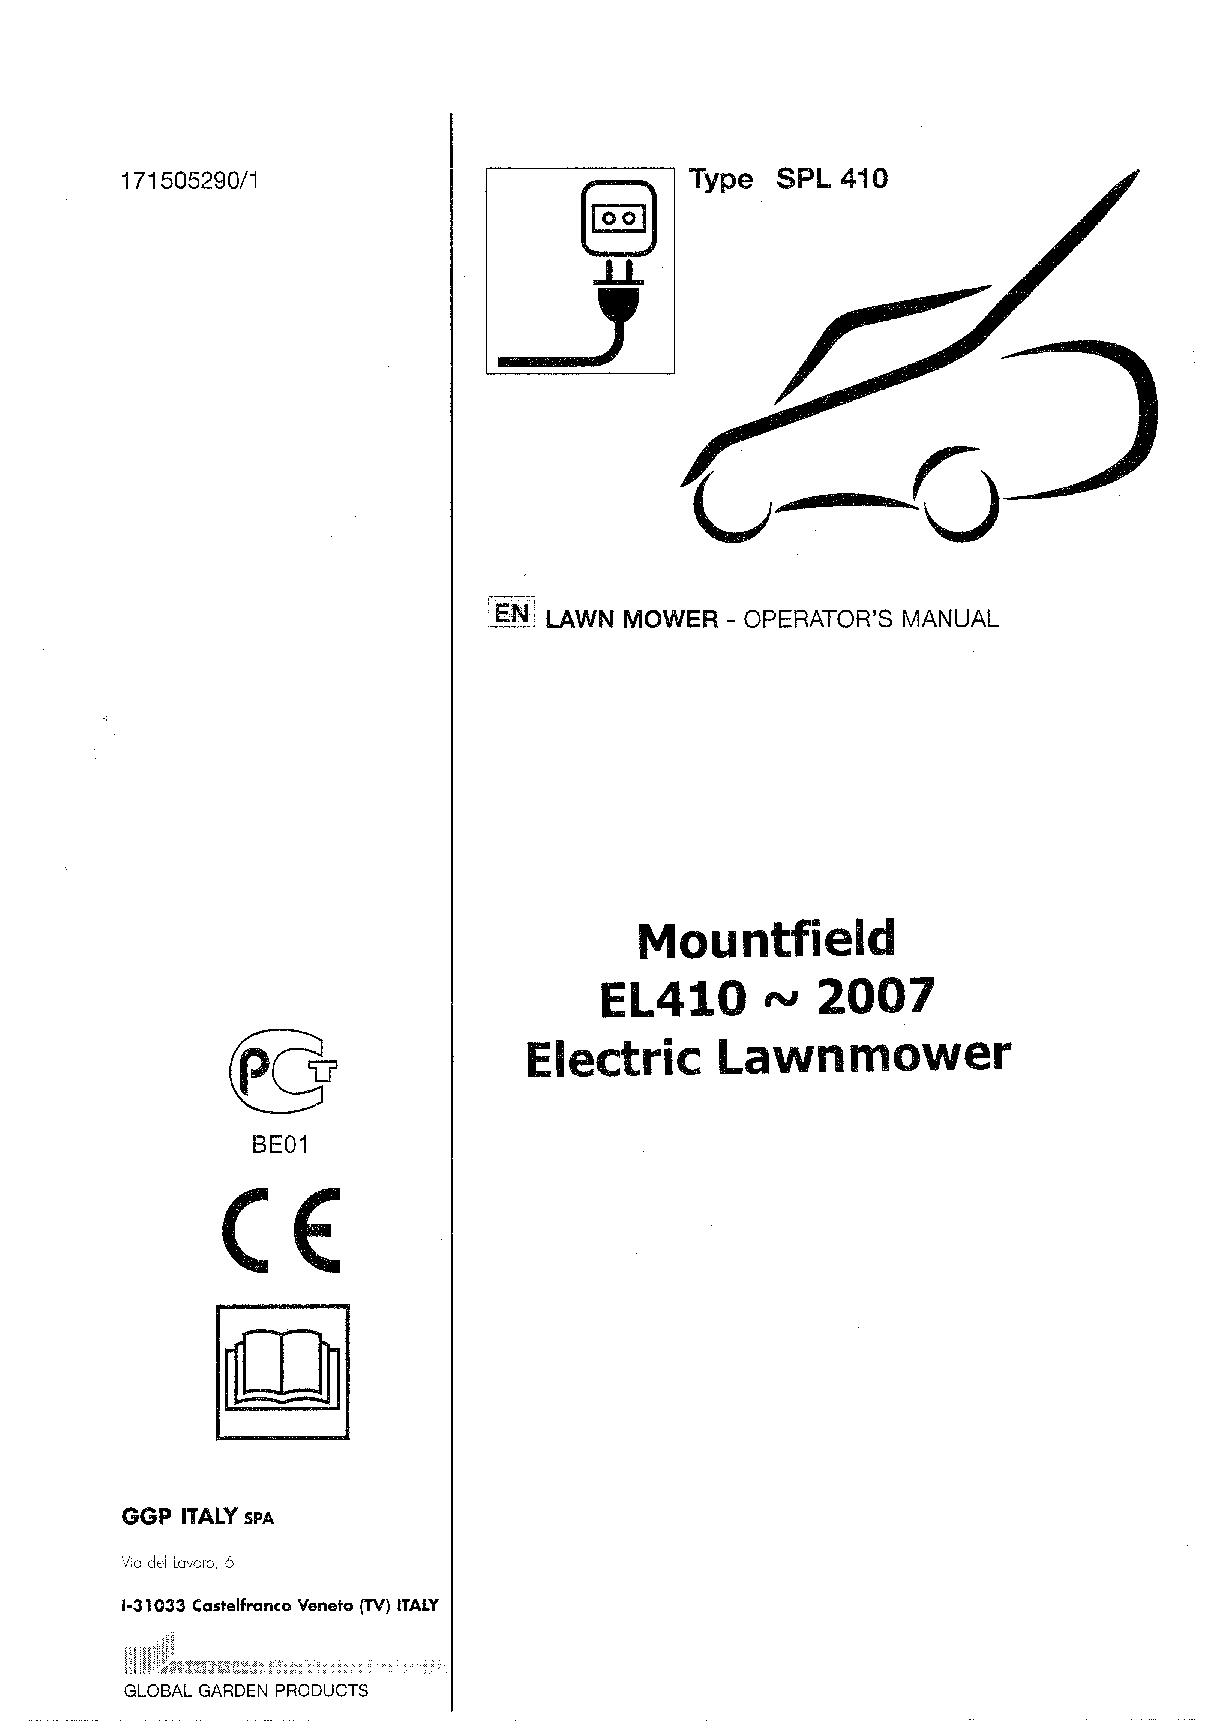 Mountfield Manuals